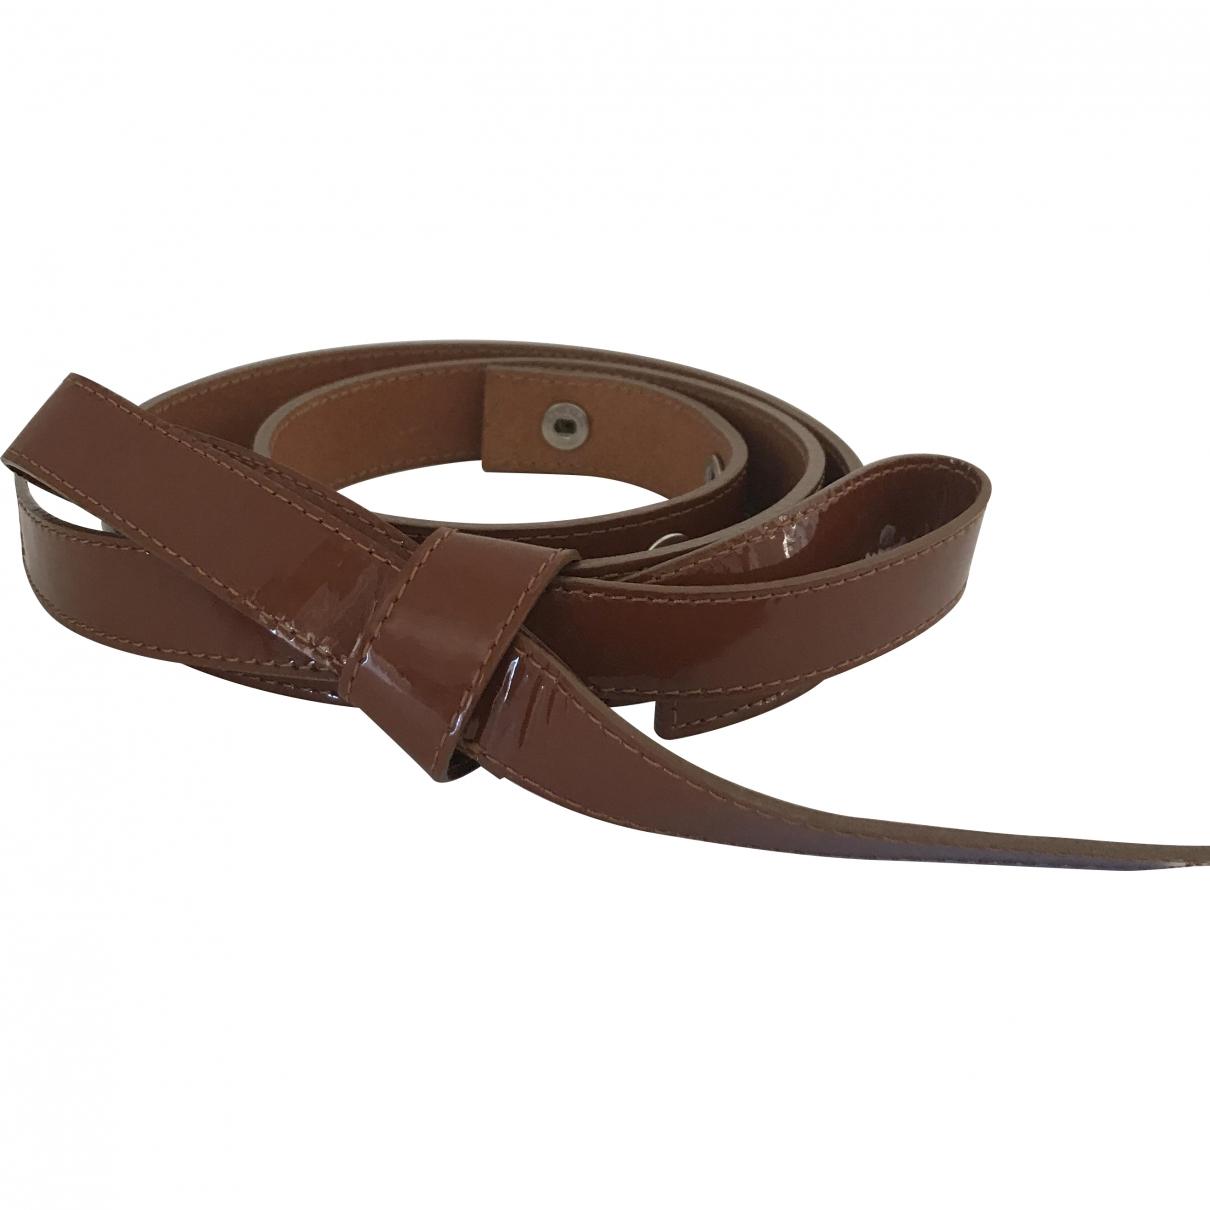 Sonia Rykiel \N Camel Patent leather belt for Women M International